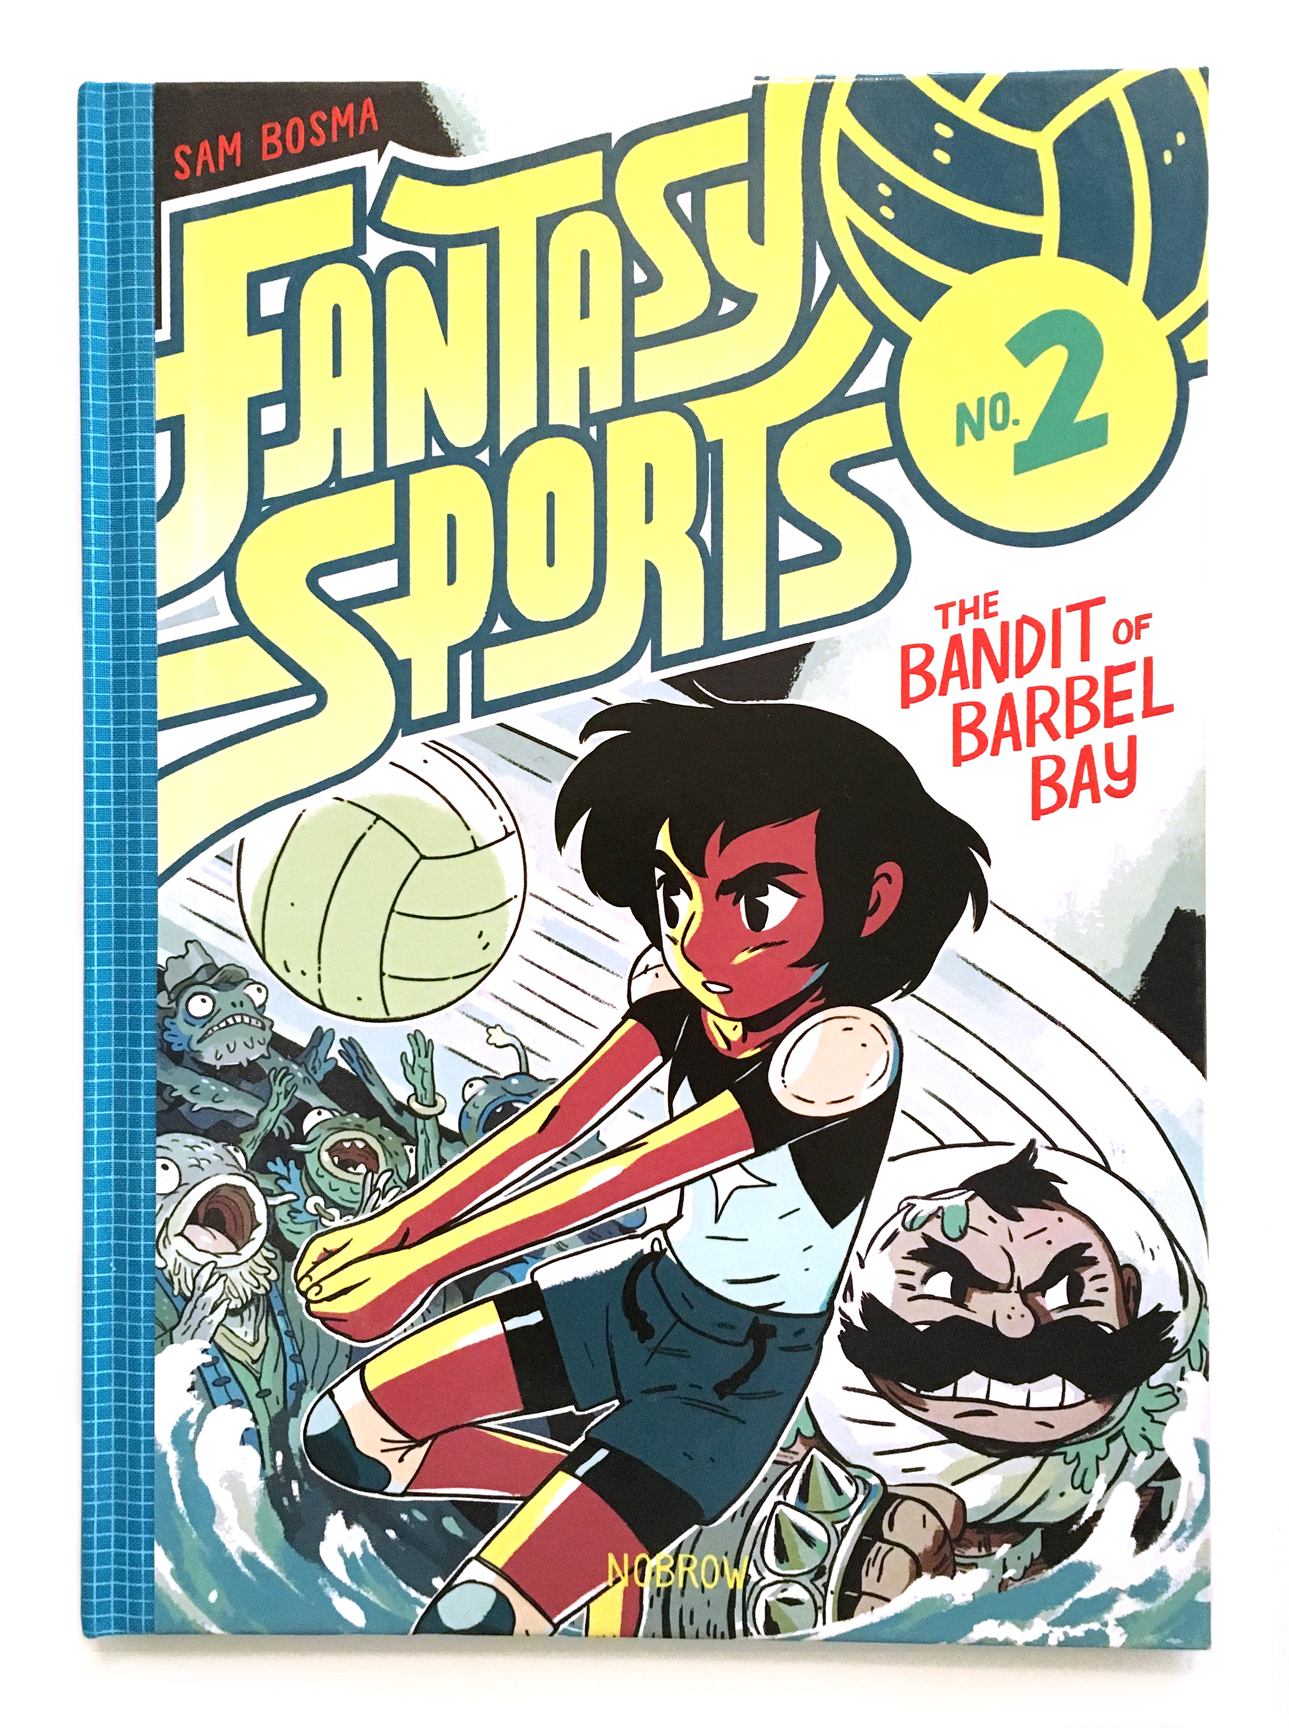 Fantasy Sports #2: The Bandit of Barbel Bay